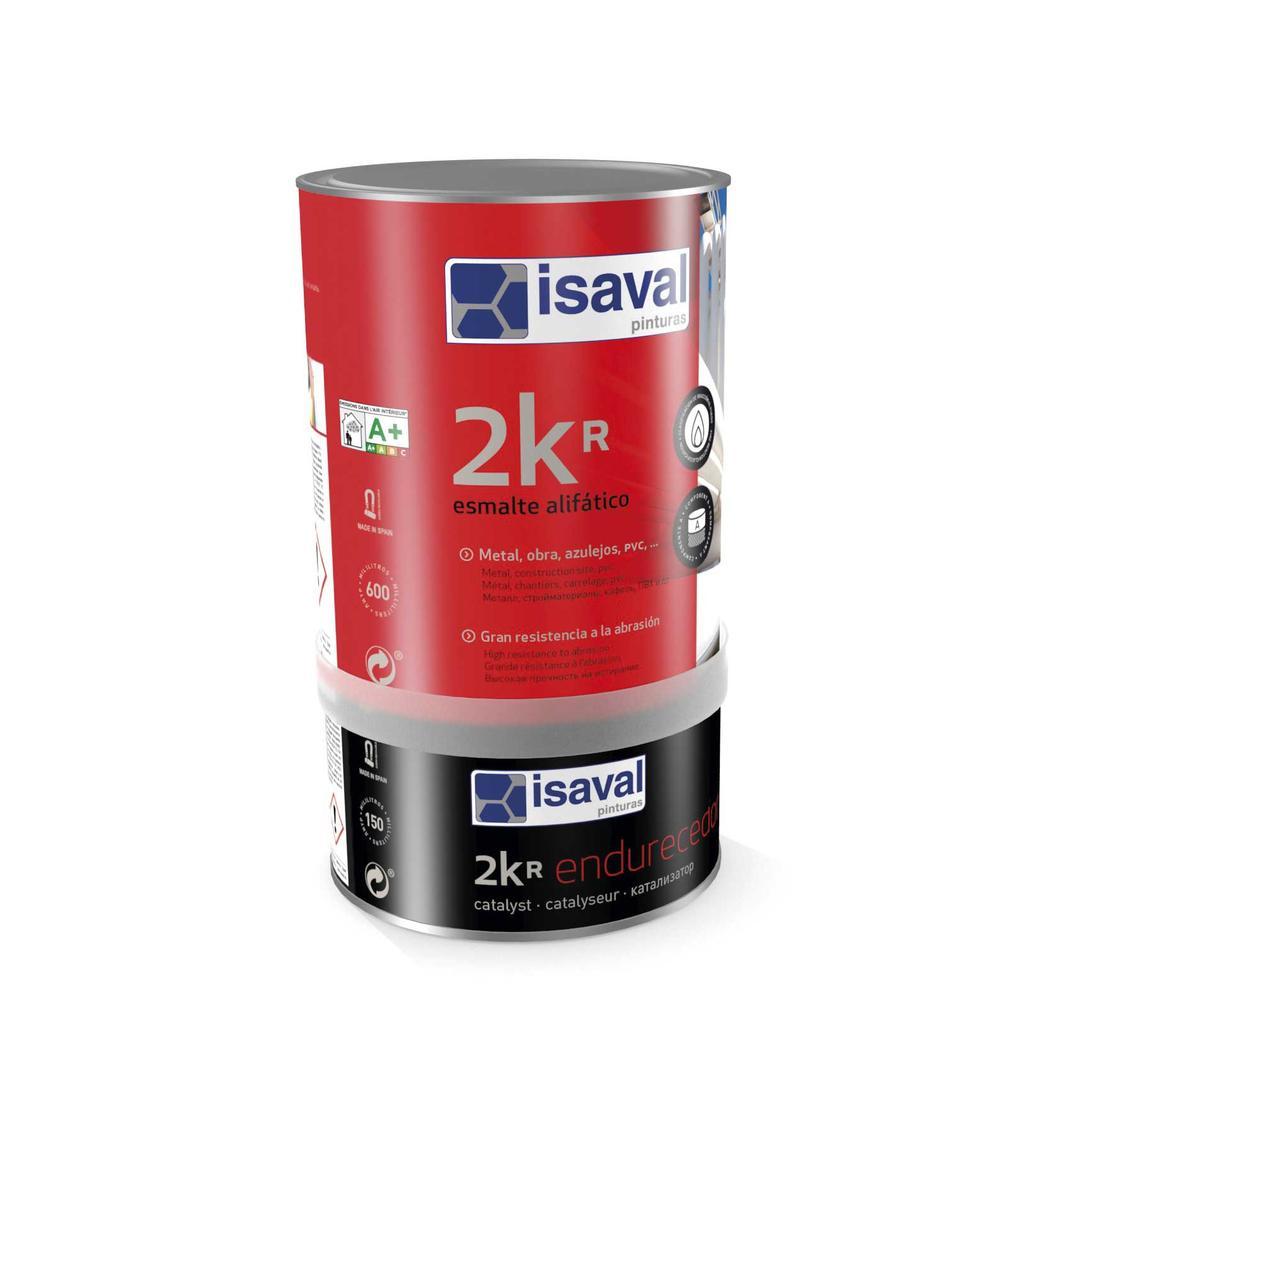 Акрил-поліуретанова 2-компонентна лак-емаль универсальна 2Кр isaval 0,75л до 8м²/шар